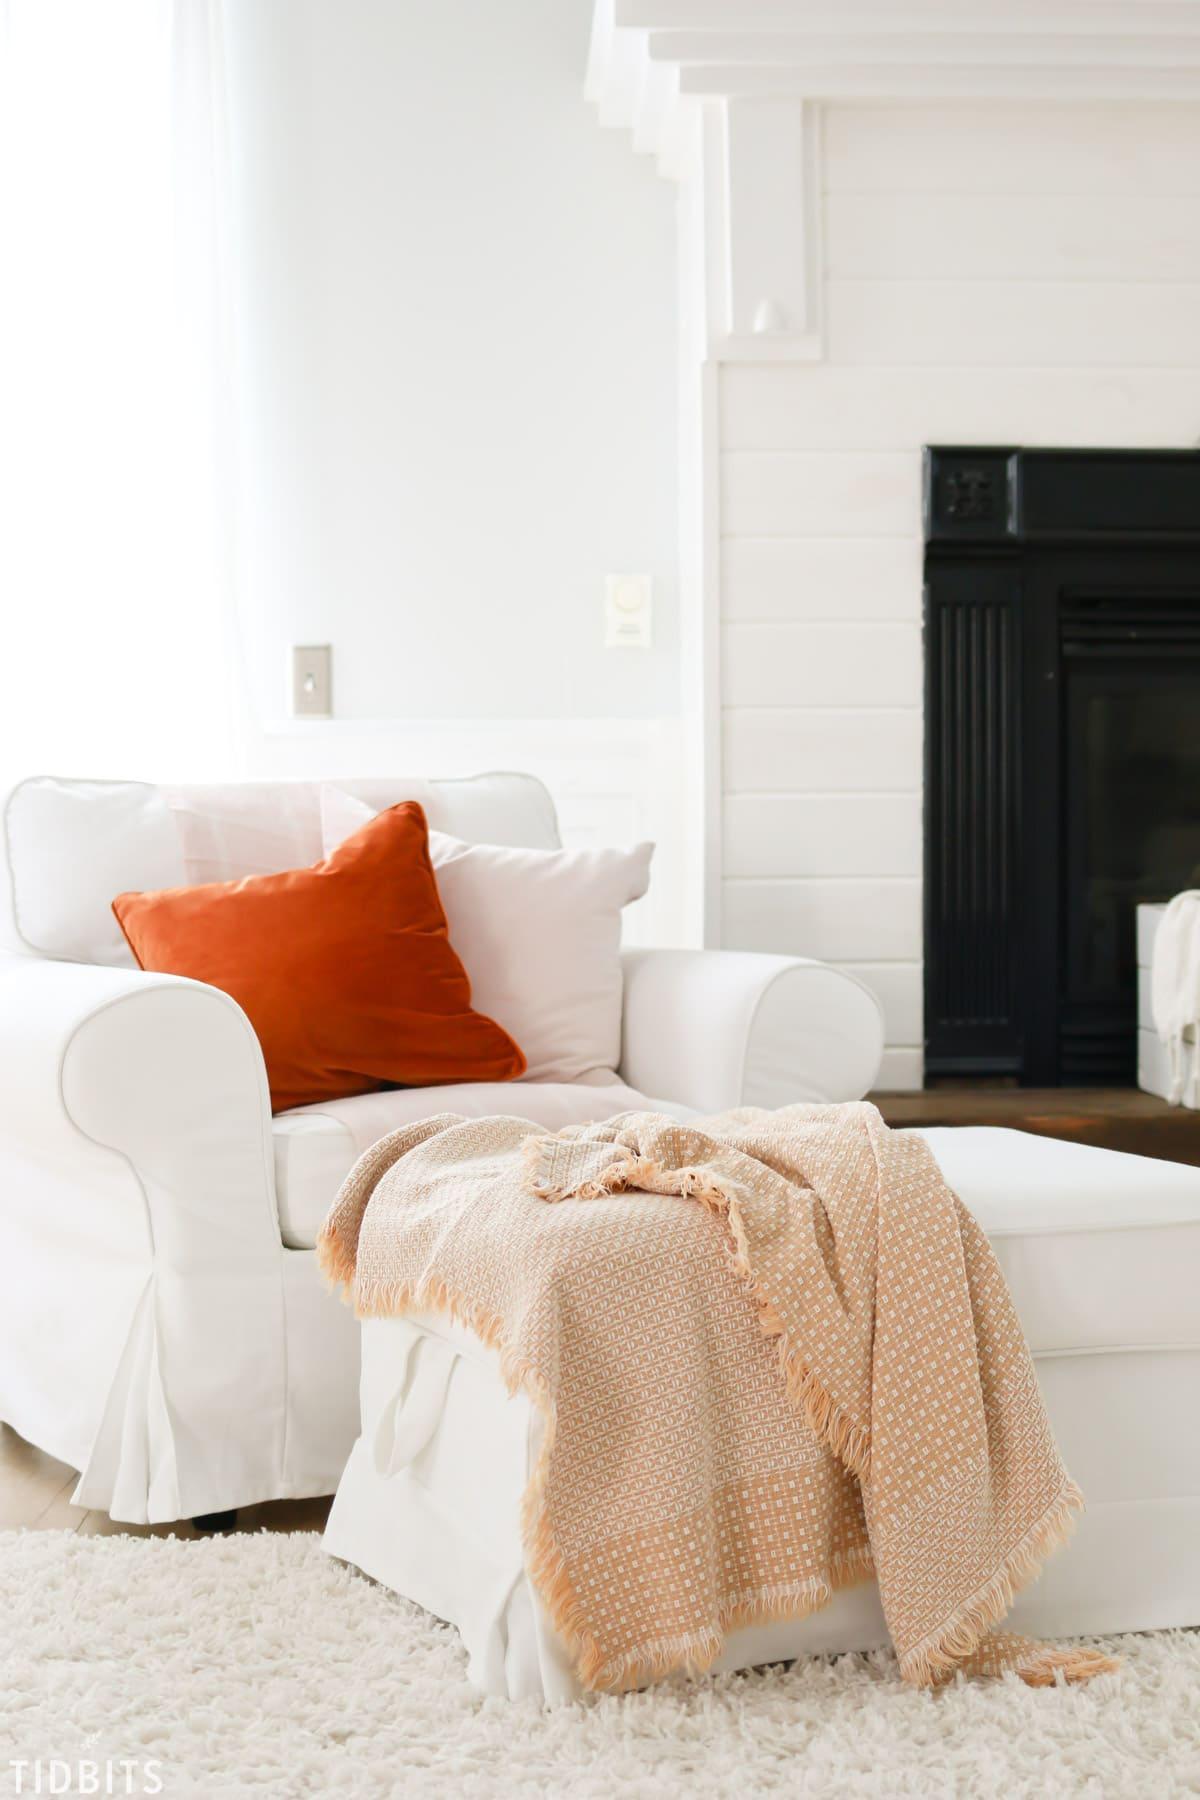 Tidbits Fall Home Tour - Living Room What Small Seasonal